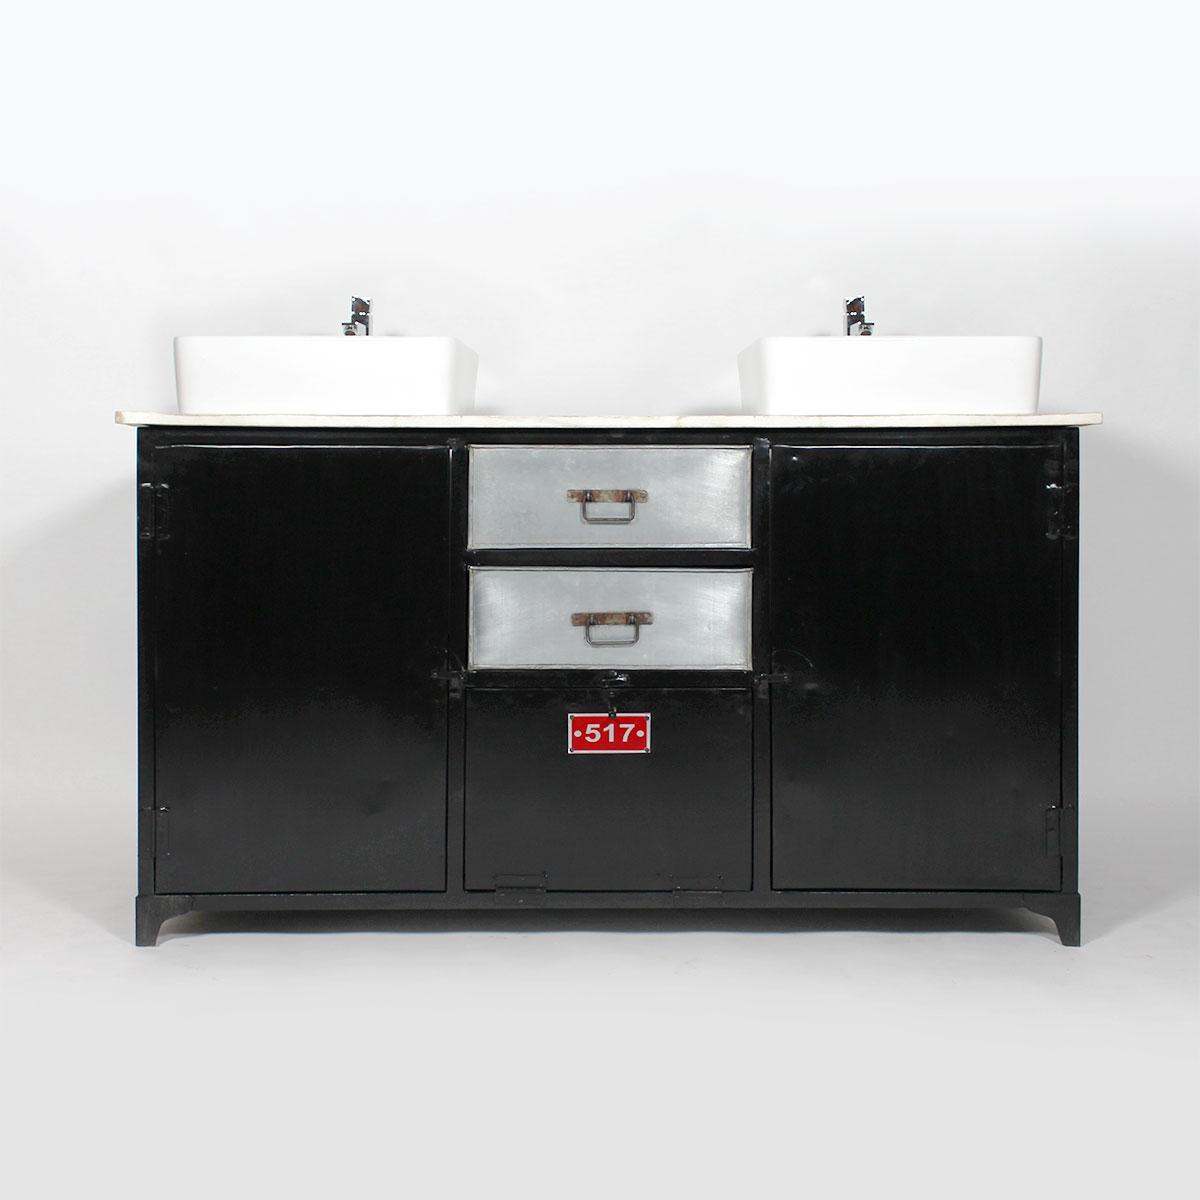 Conseils d co pour choisir son meuble salle de bain metal for Meuble sdb noir